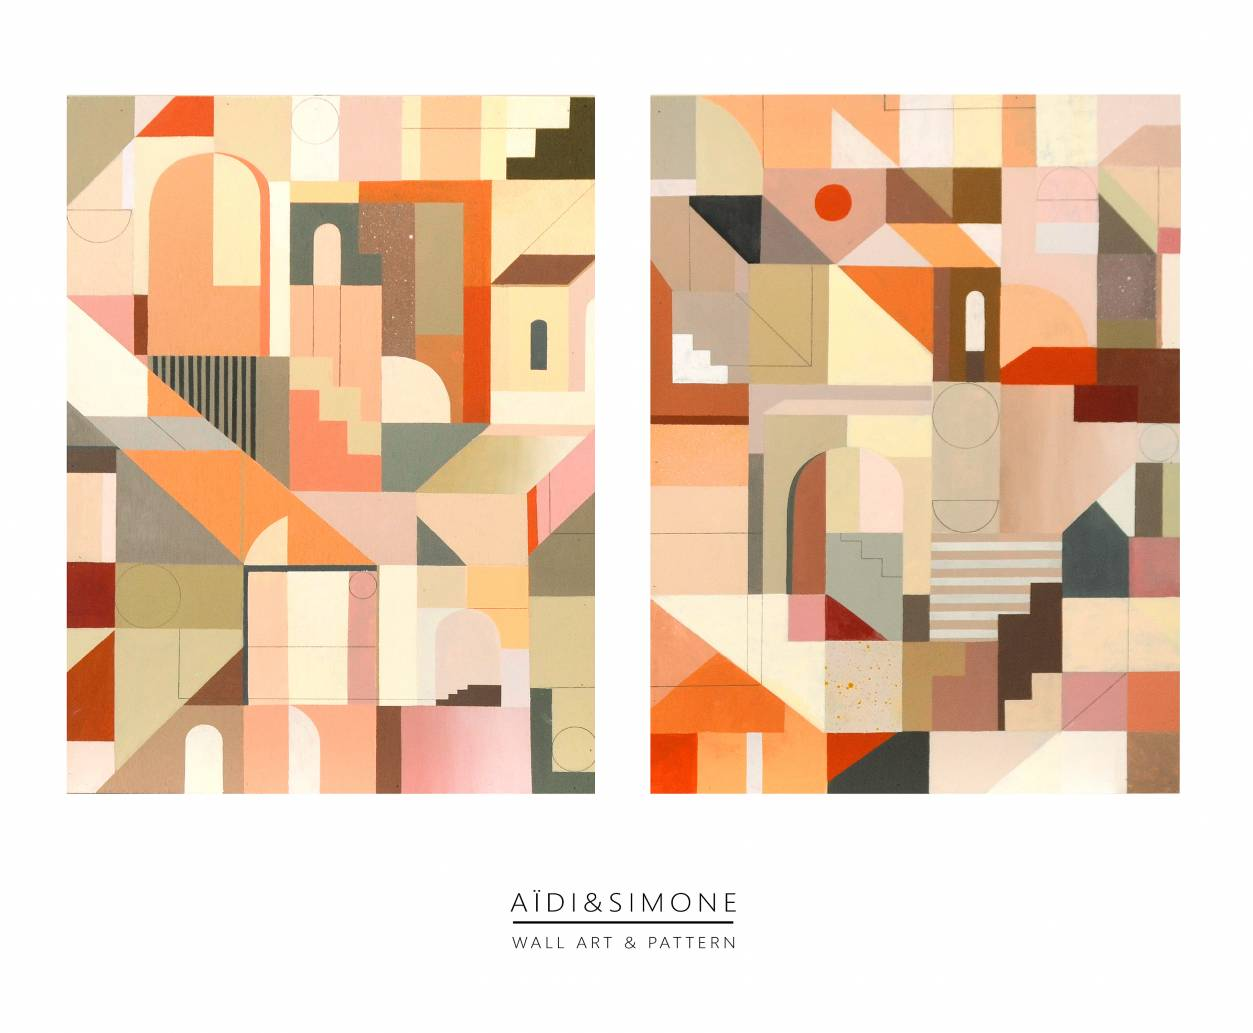 HOMES (2020) - Aida Tejero Olivan - aidiandsimone